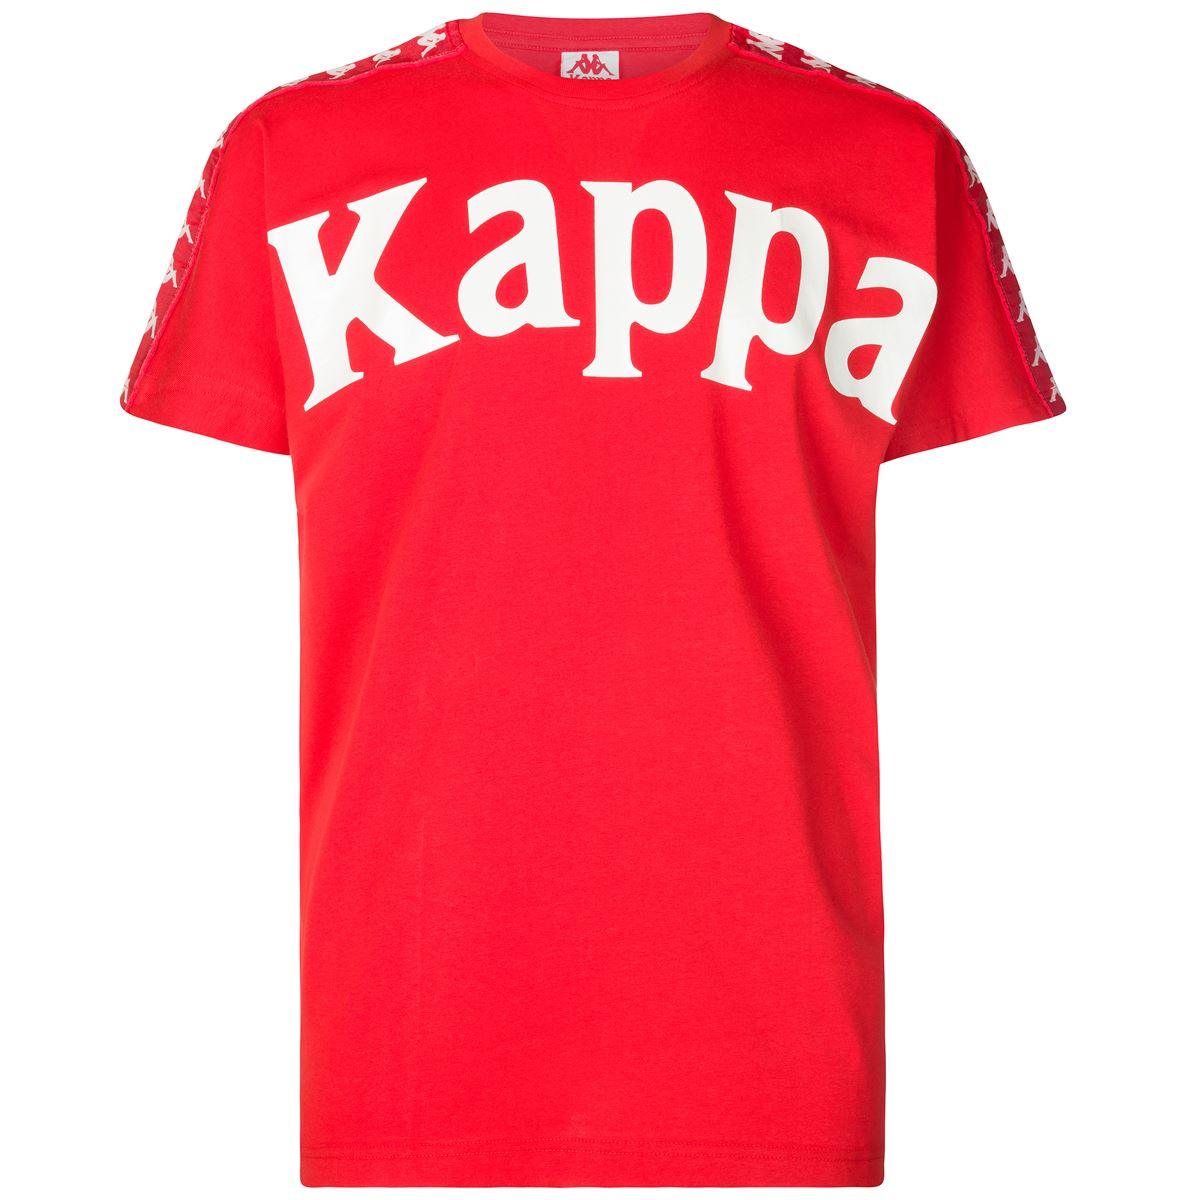 T-SHIRT KAPPA KAPPA   T-shirt m/m   304S7M0A0X